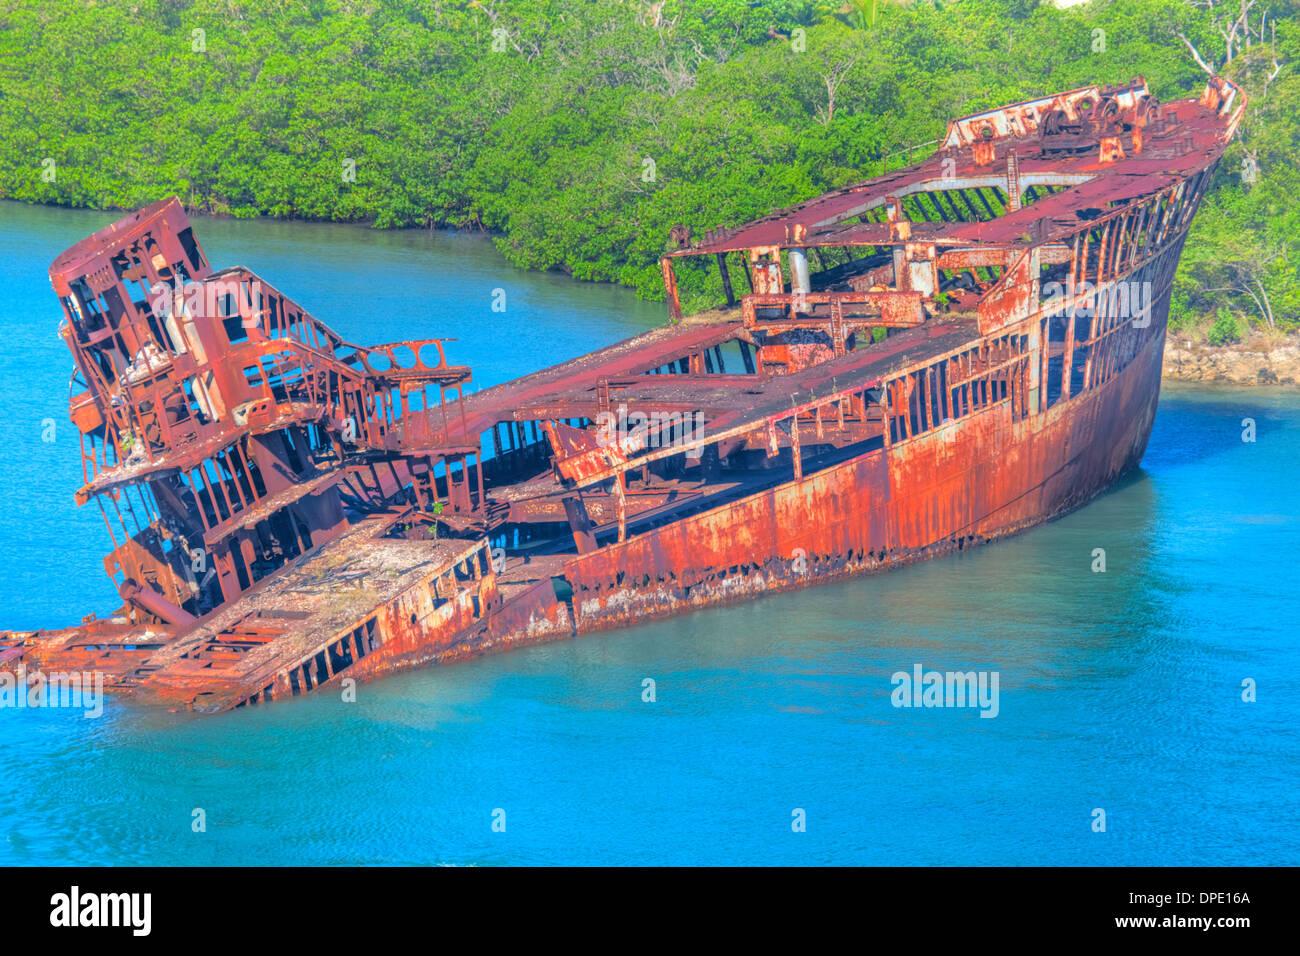 Shipwreck on shore of Roatan Island, Honduras, Near Meso-American Barrier Reef - Stock Image